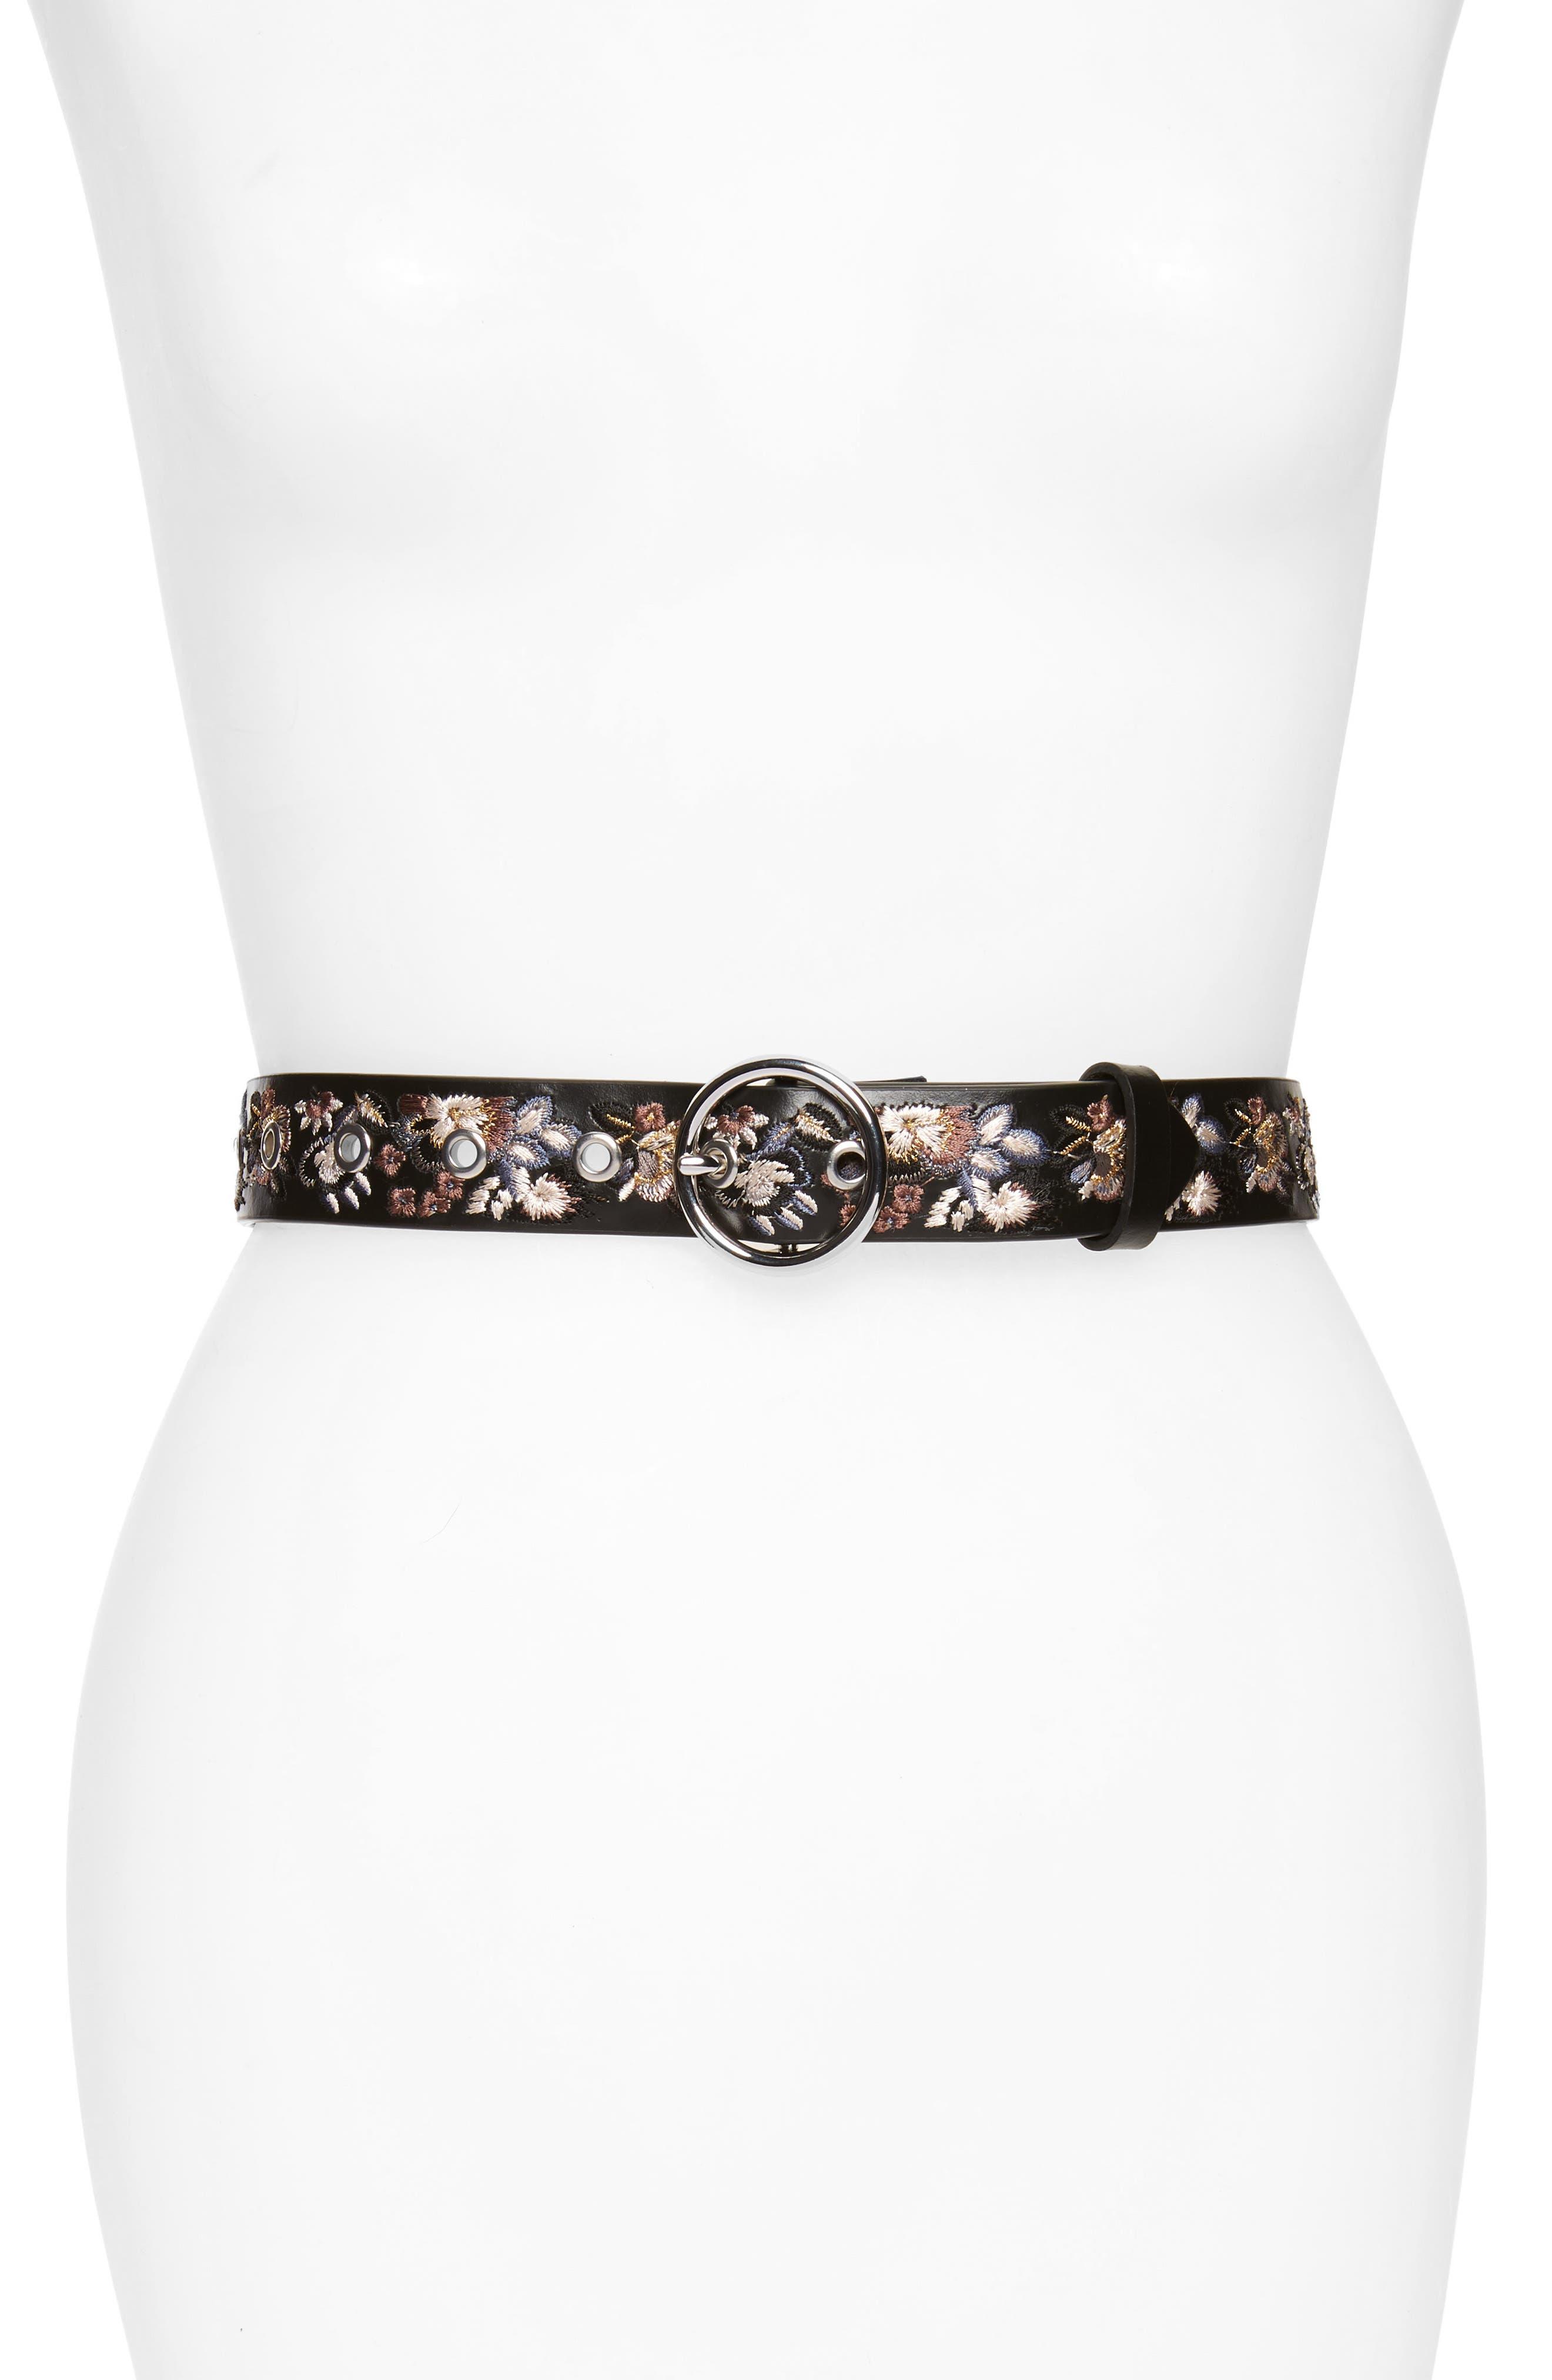 Embroidered Leather Belt,                         Main,                         color, Black / Pol Nickel